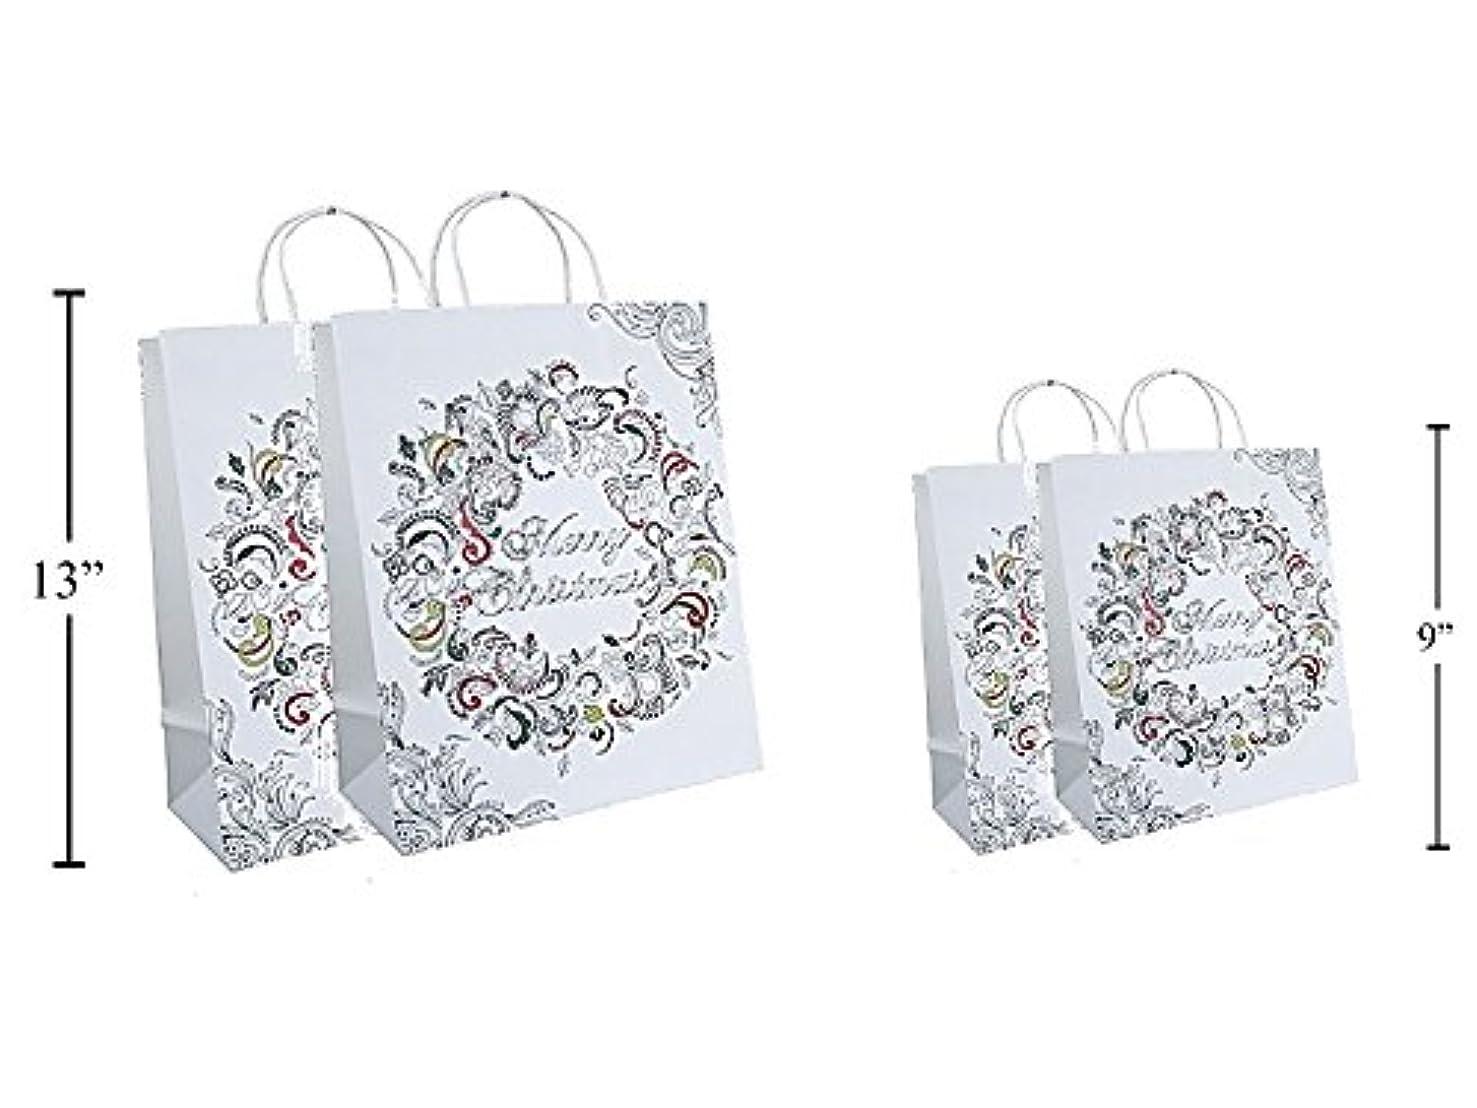 Christmas Paper Color-Me Gift Bags 4 Pack (2ea Large & 2ea Medium Combo)